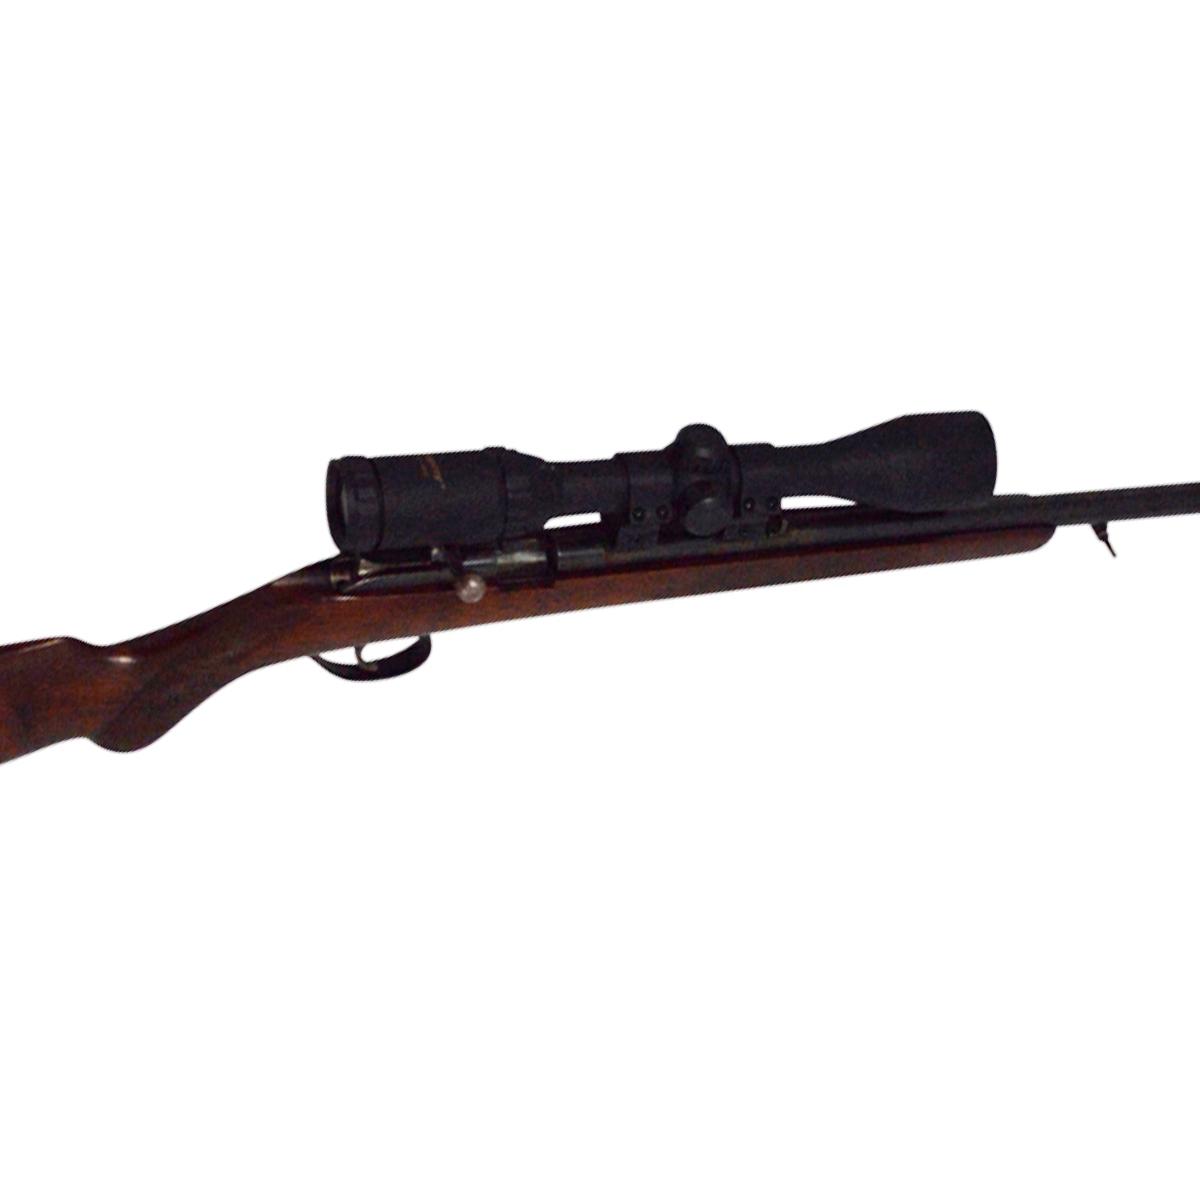 Husqvarna M55 Sweden Hunting 3-9x40